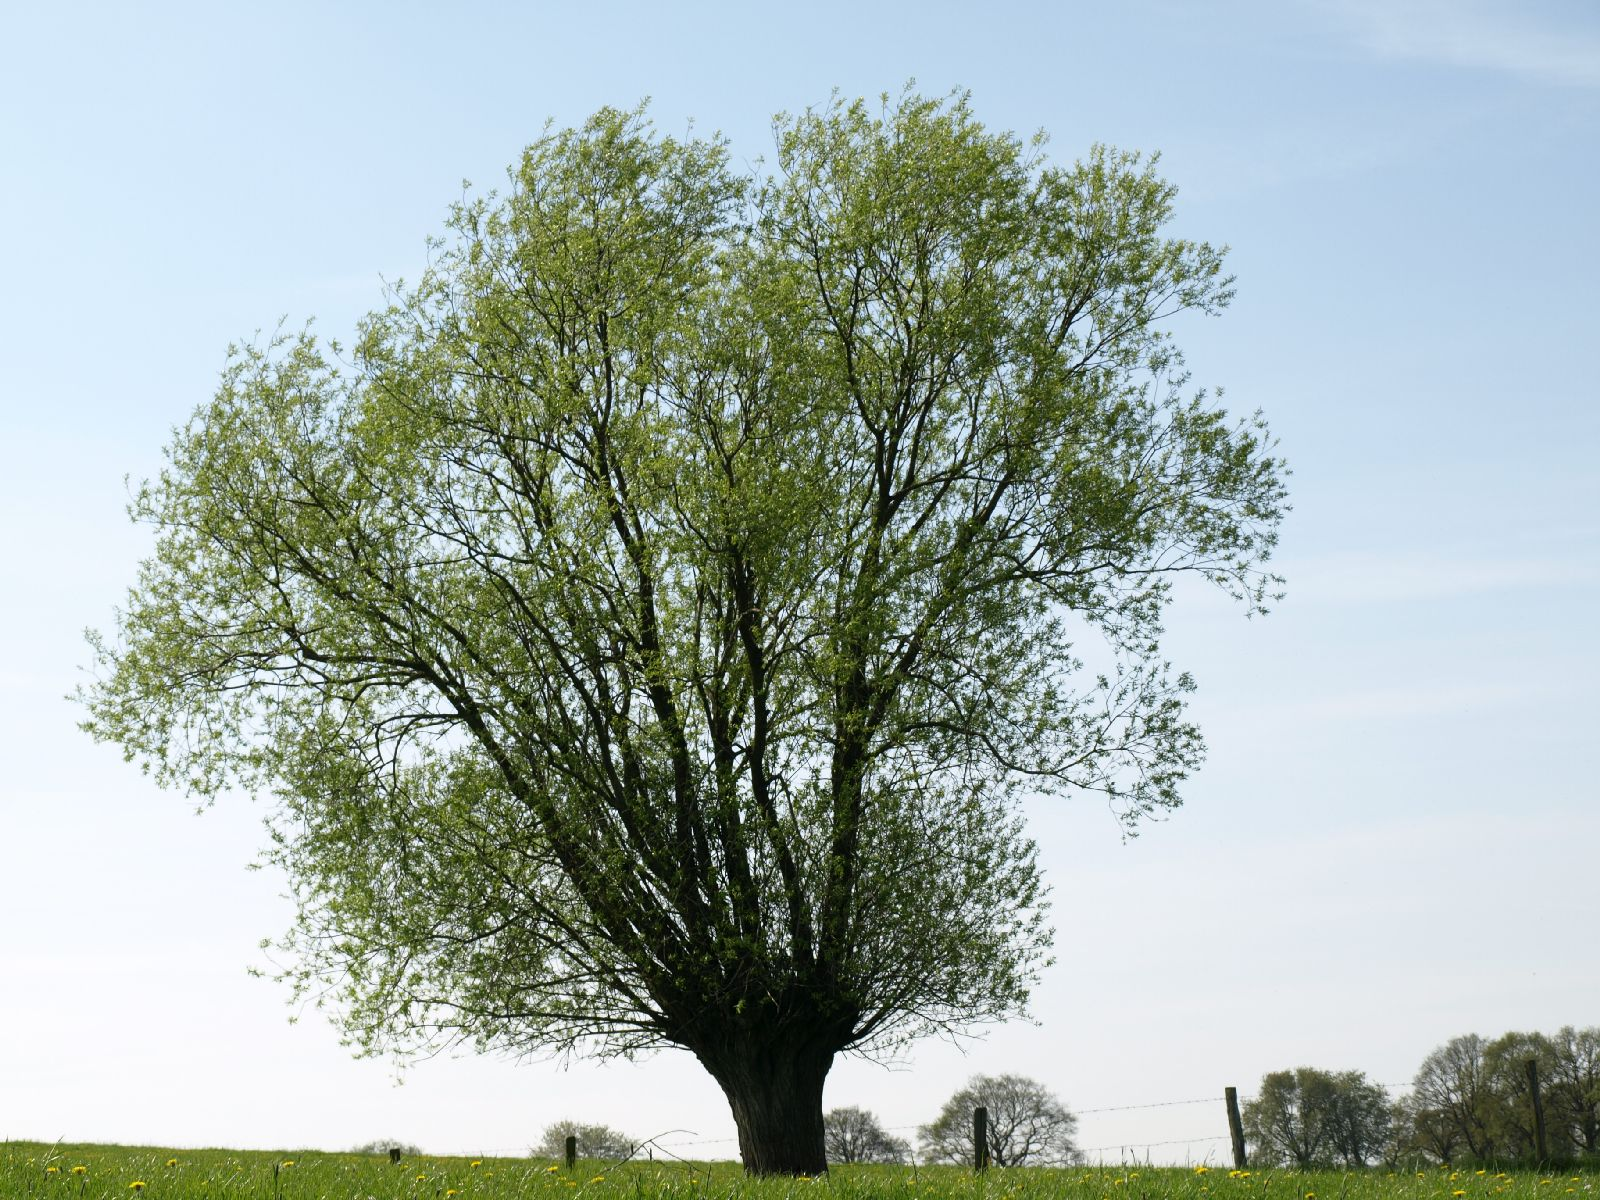 Plants-Trees_Photo_Texture_B_P5042394